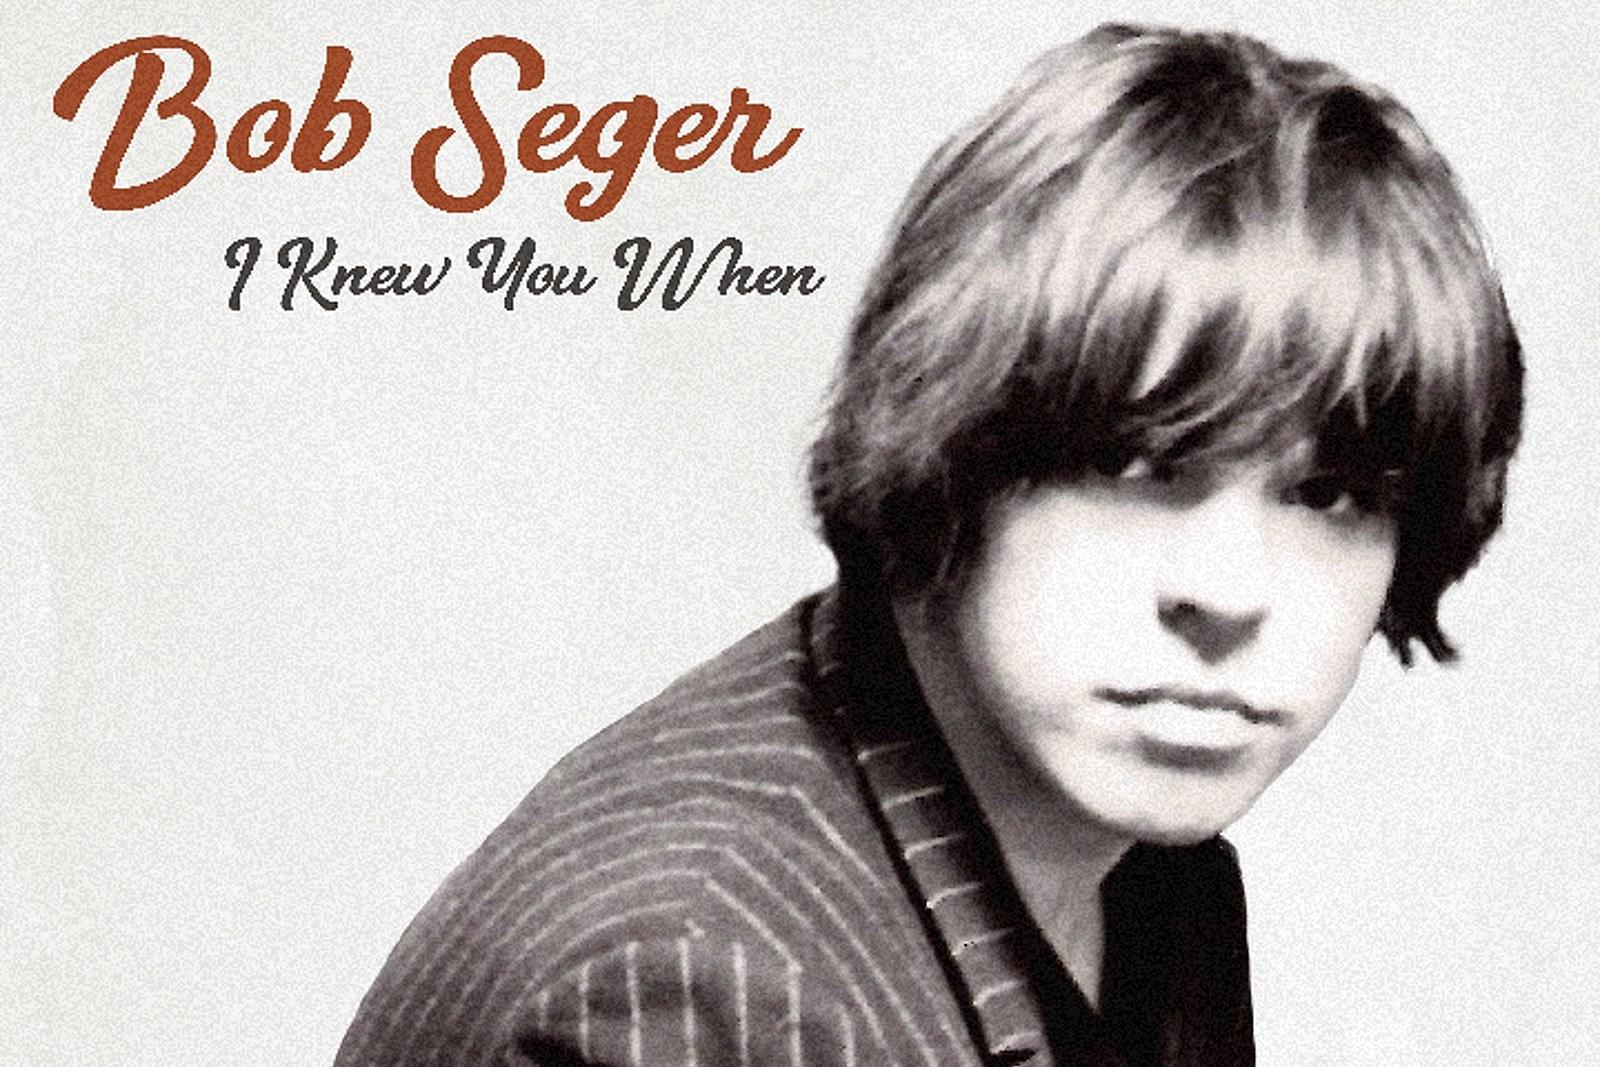 Segerb.xyz Beauteous Bob Seger Reveals Details Of New Album 'i Knew You When' Design Ideas